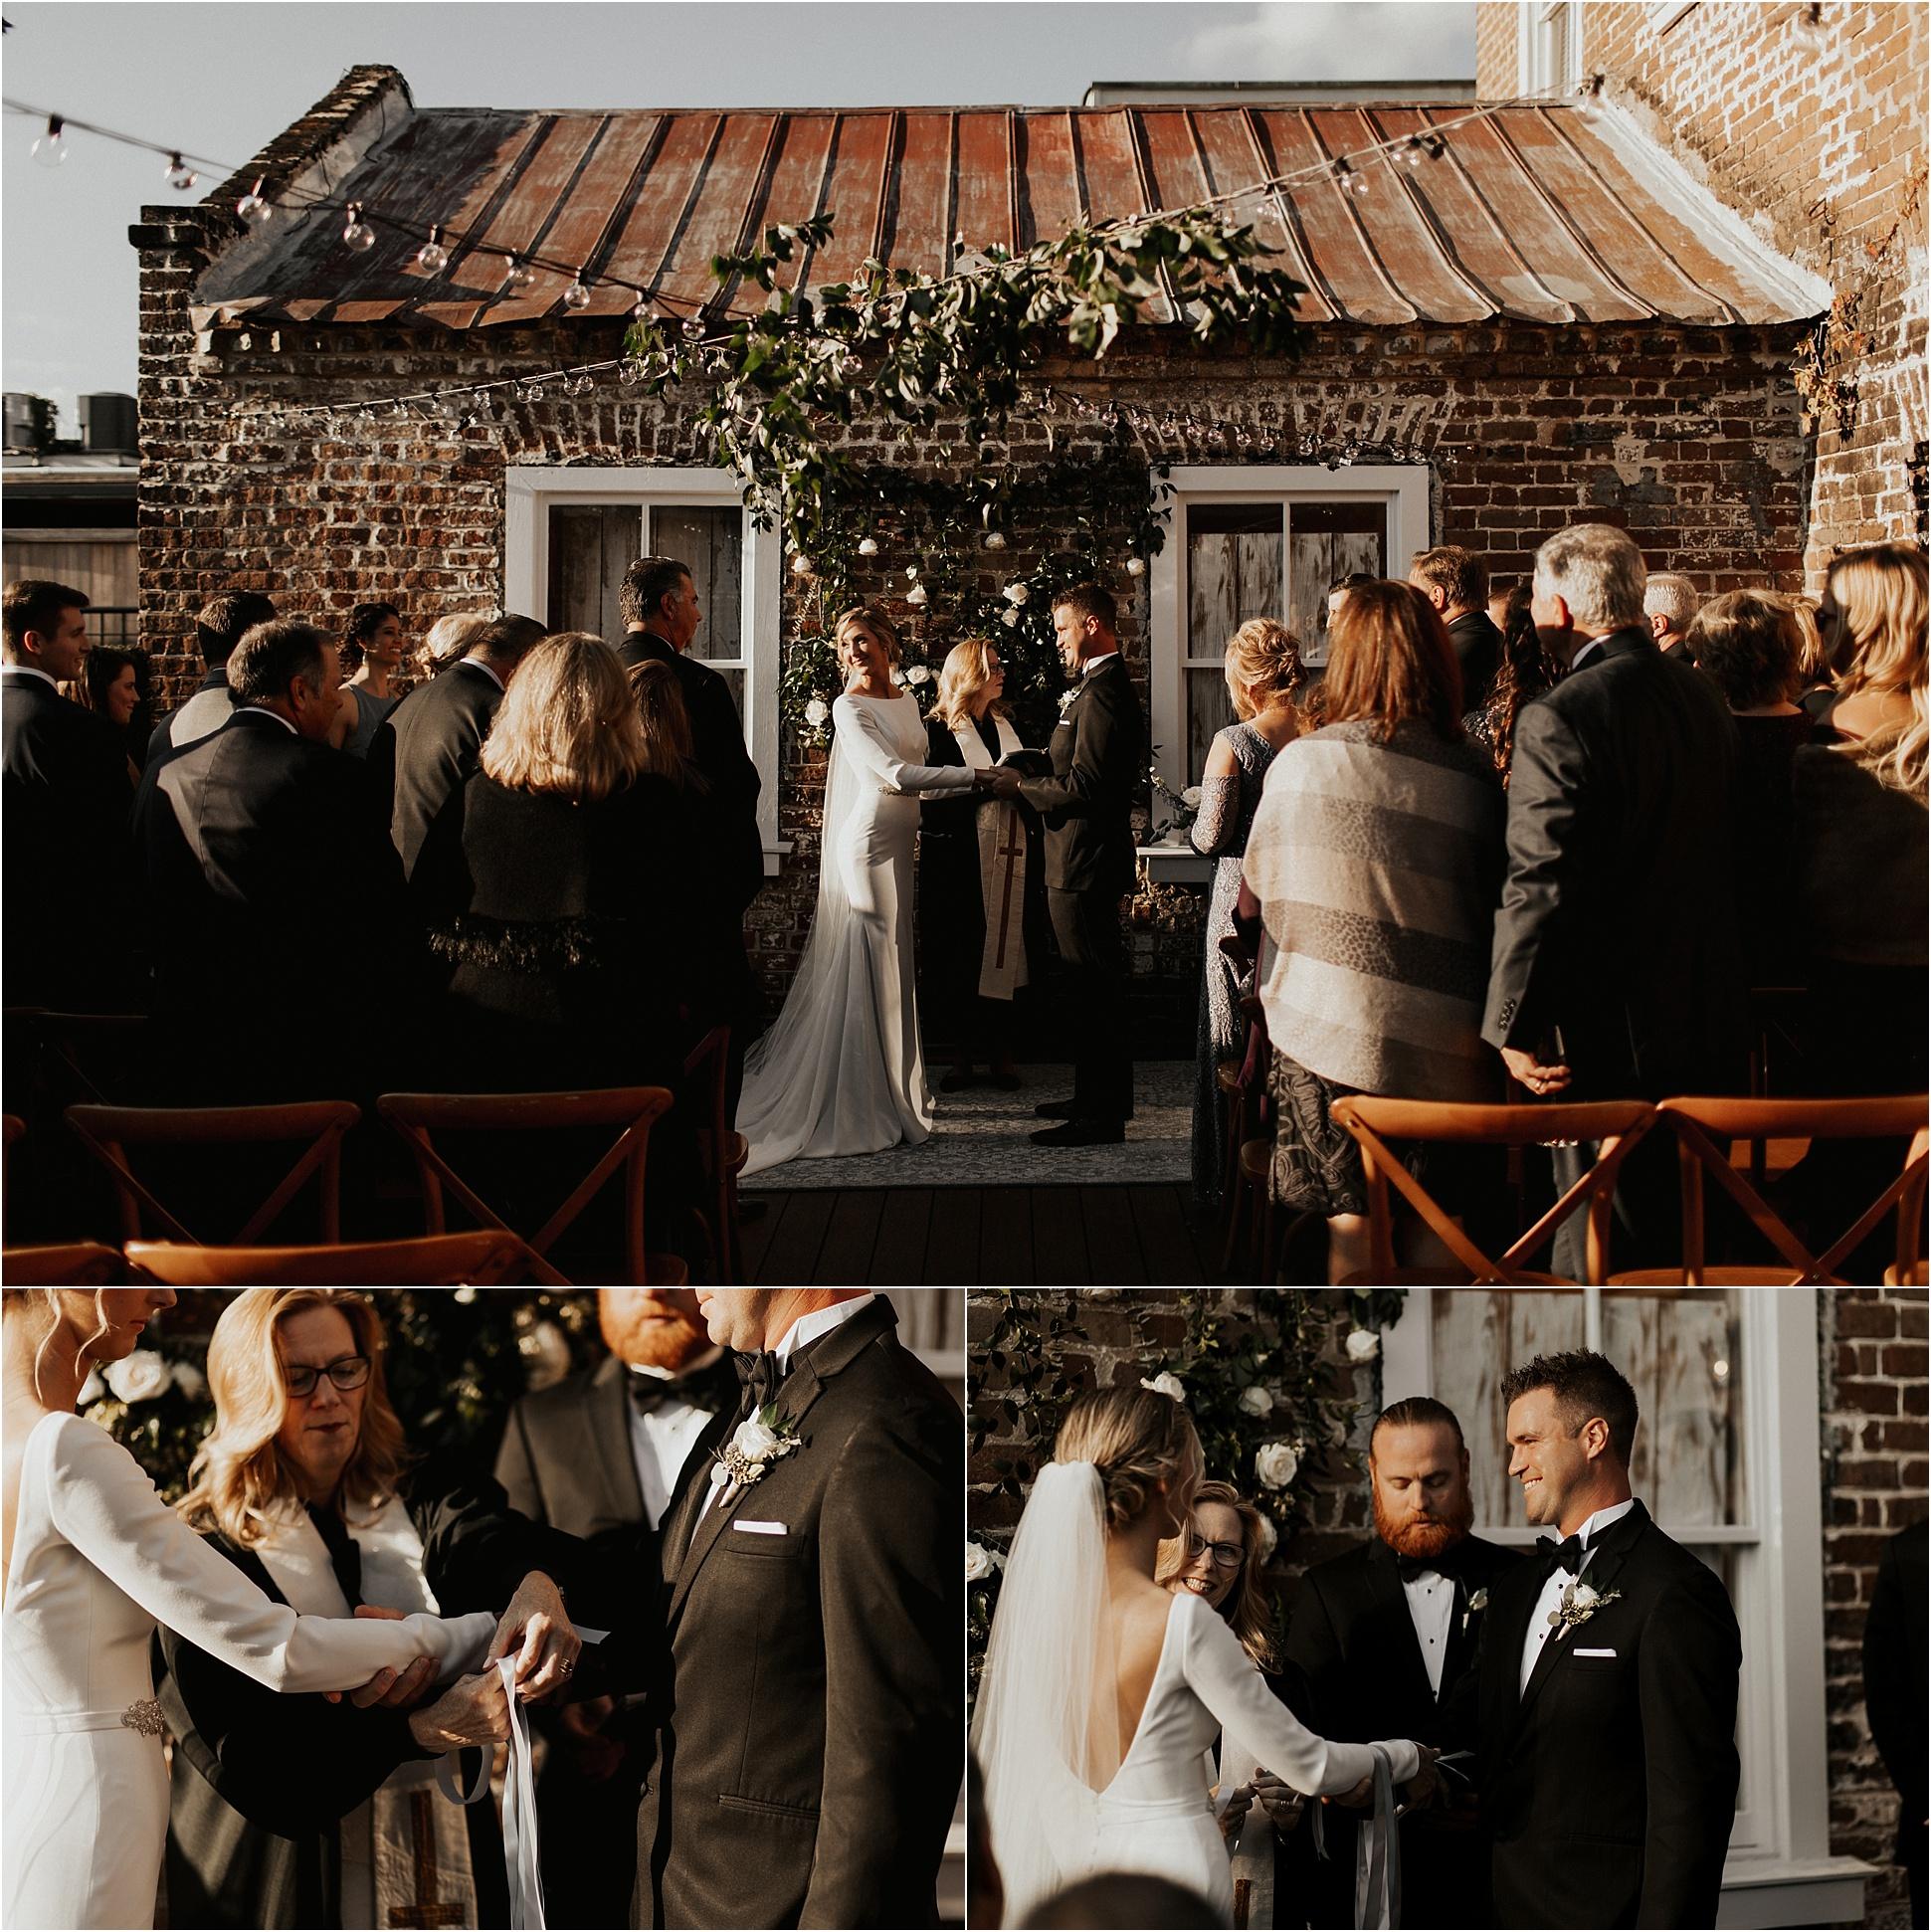 upstairs_midtown_intimate_charleston_wedding044.JPG